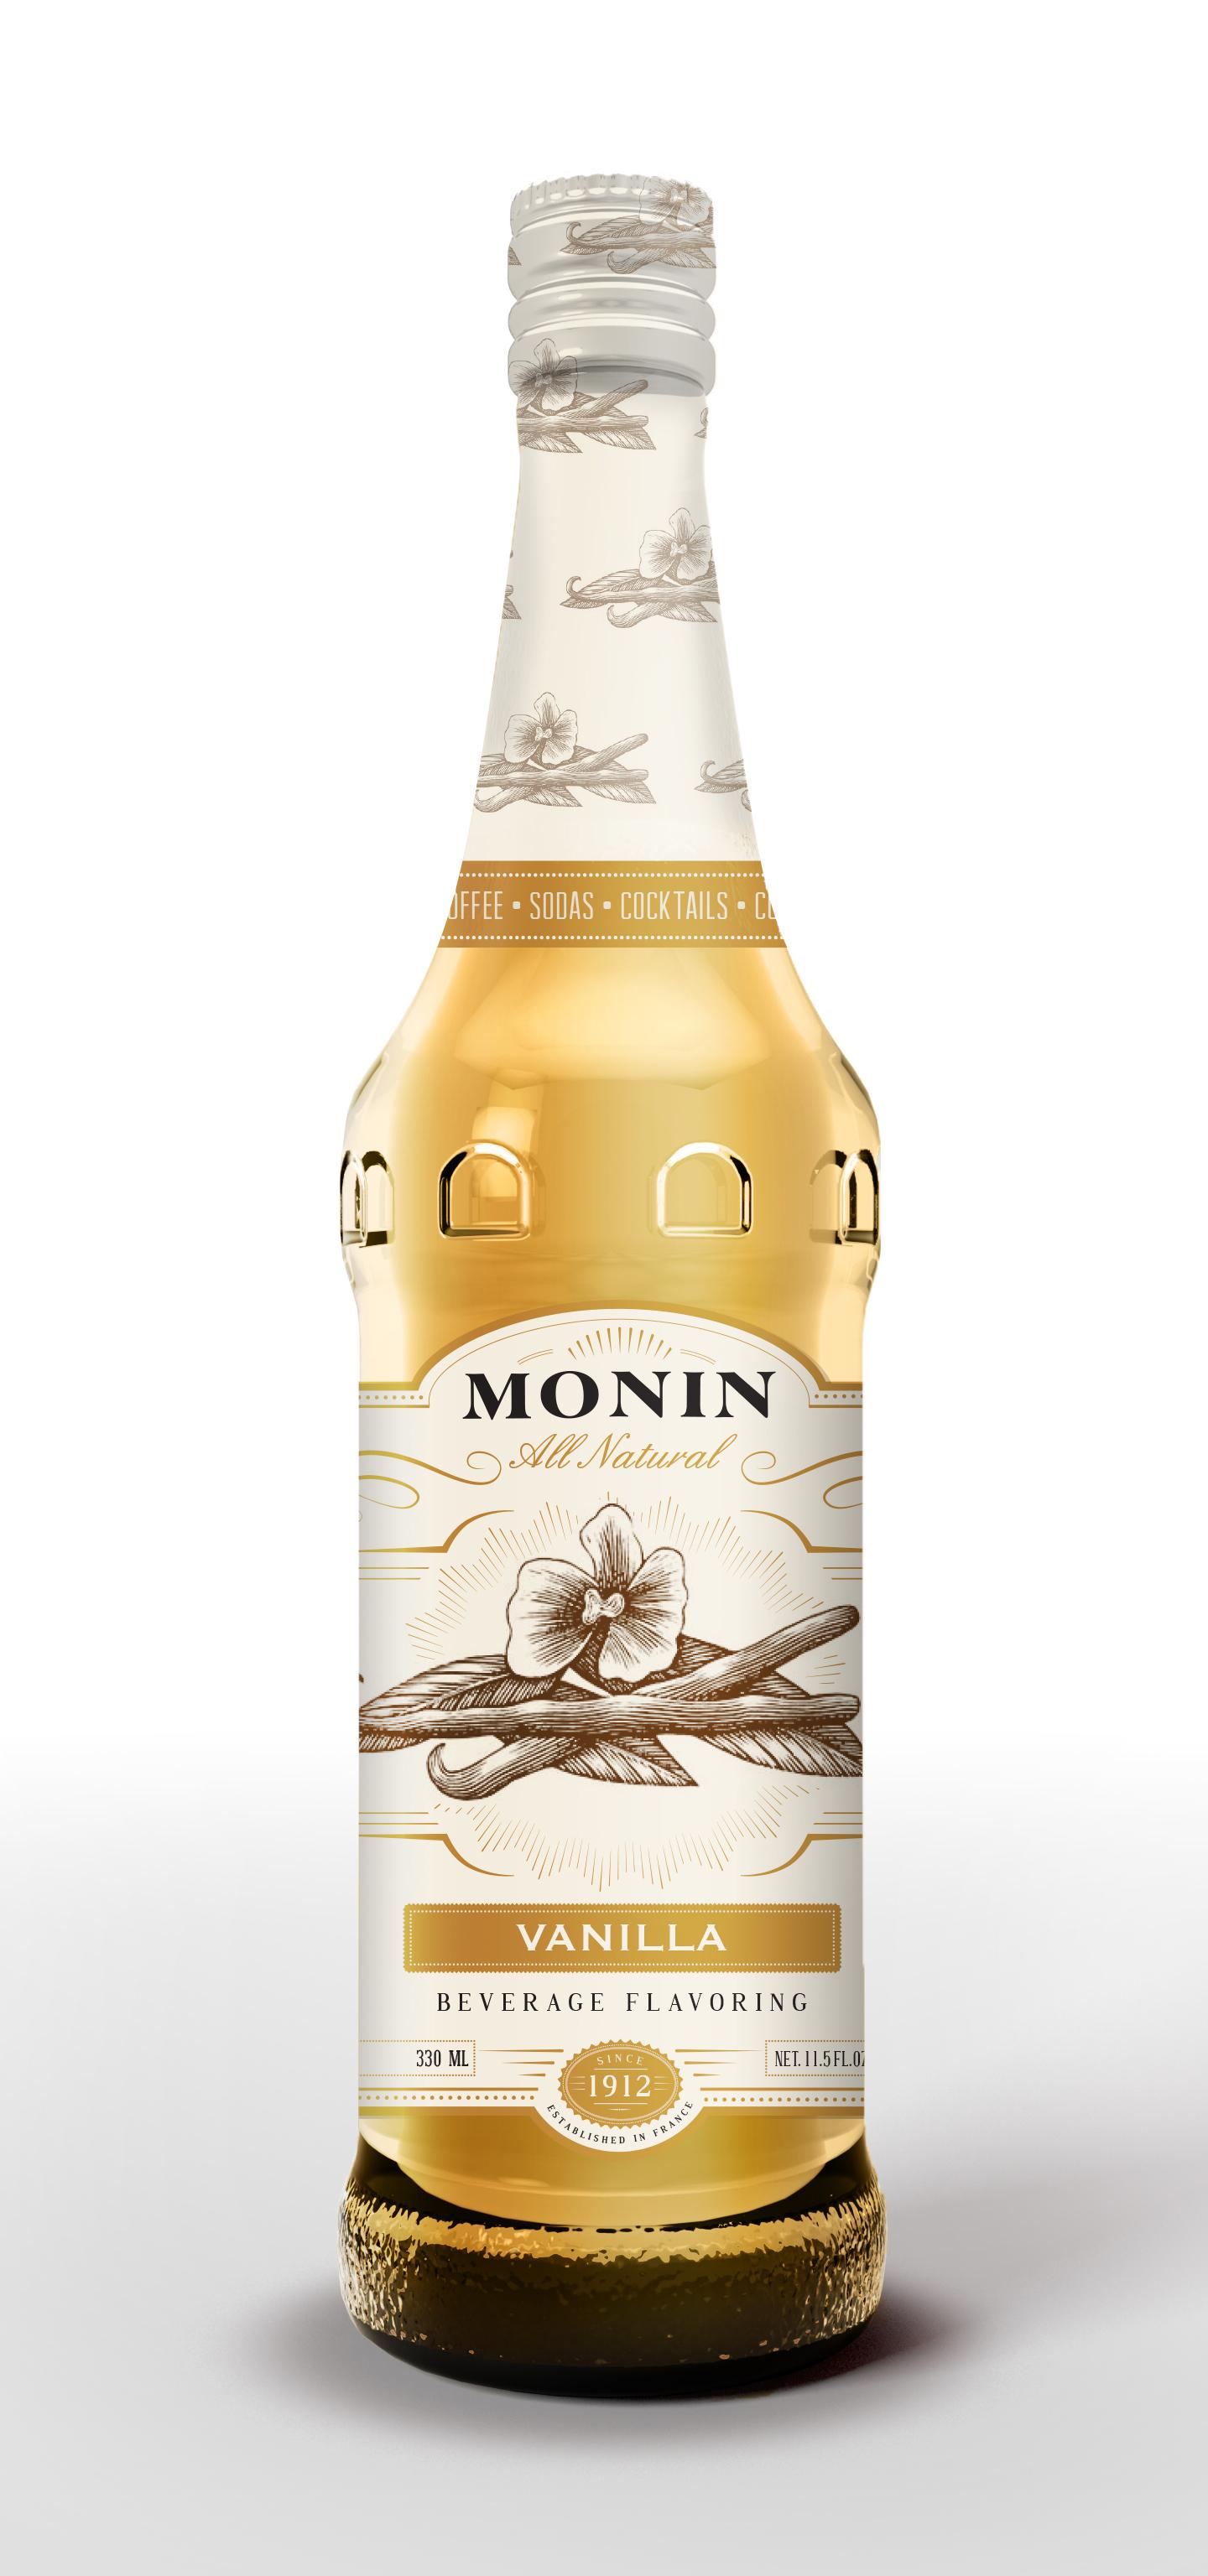 Monin_Bottle_Mockup_Van4.jpg